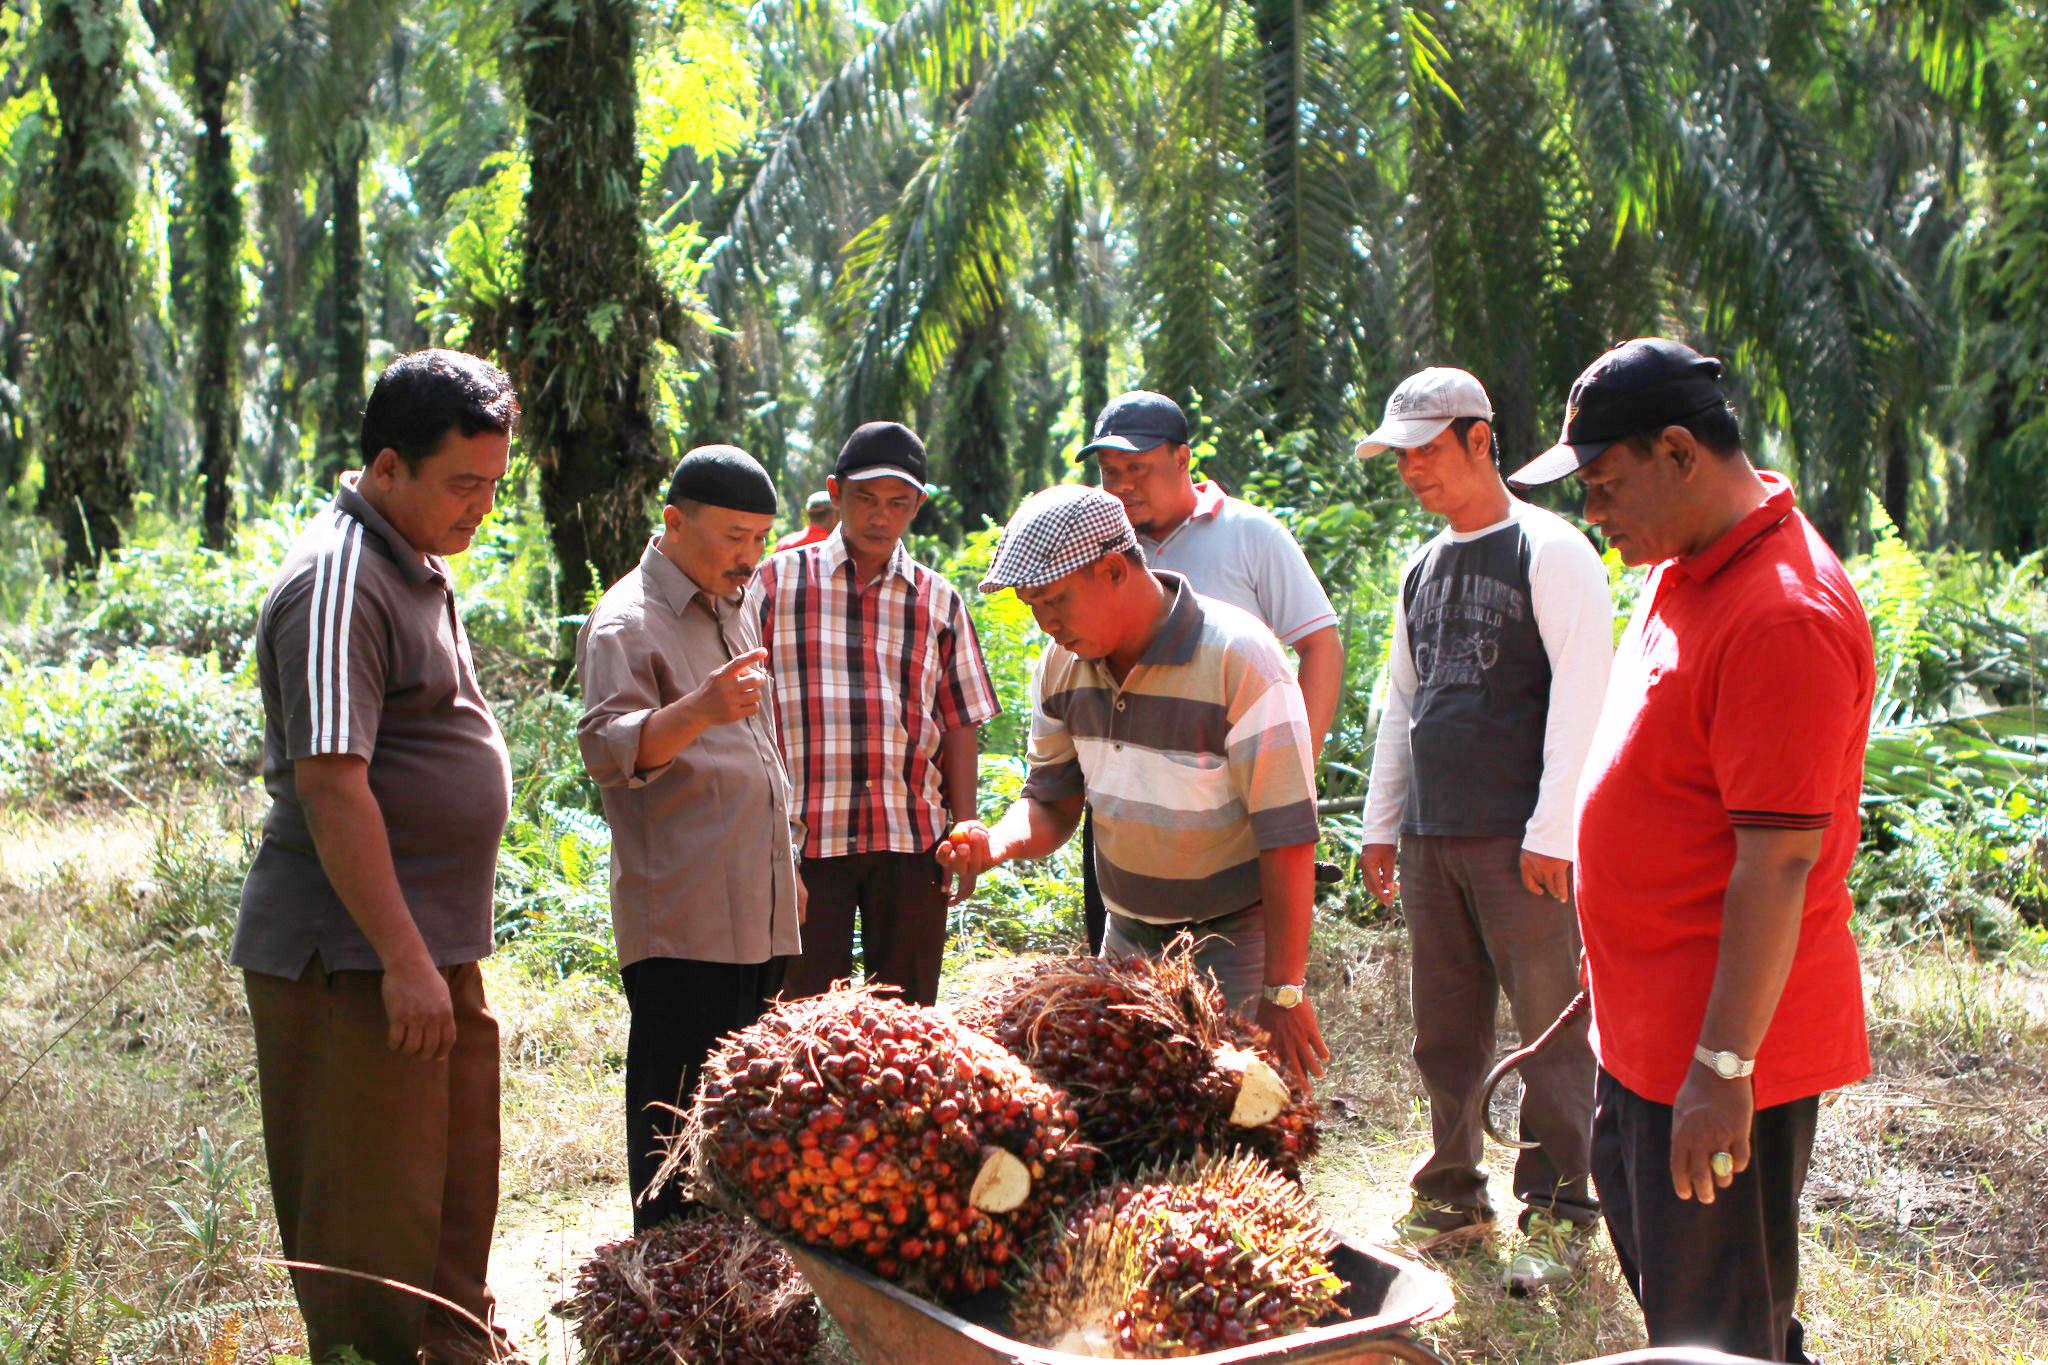 Support for smallholder